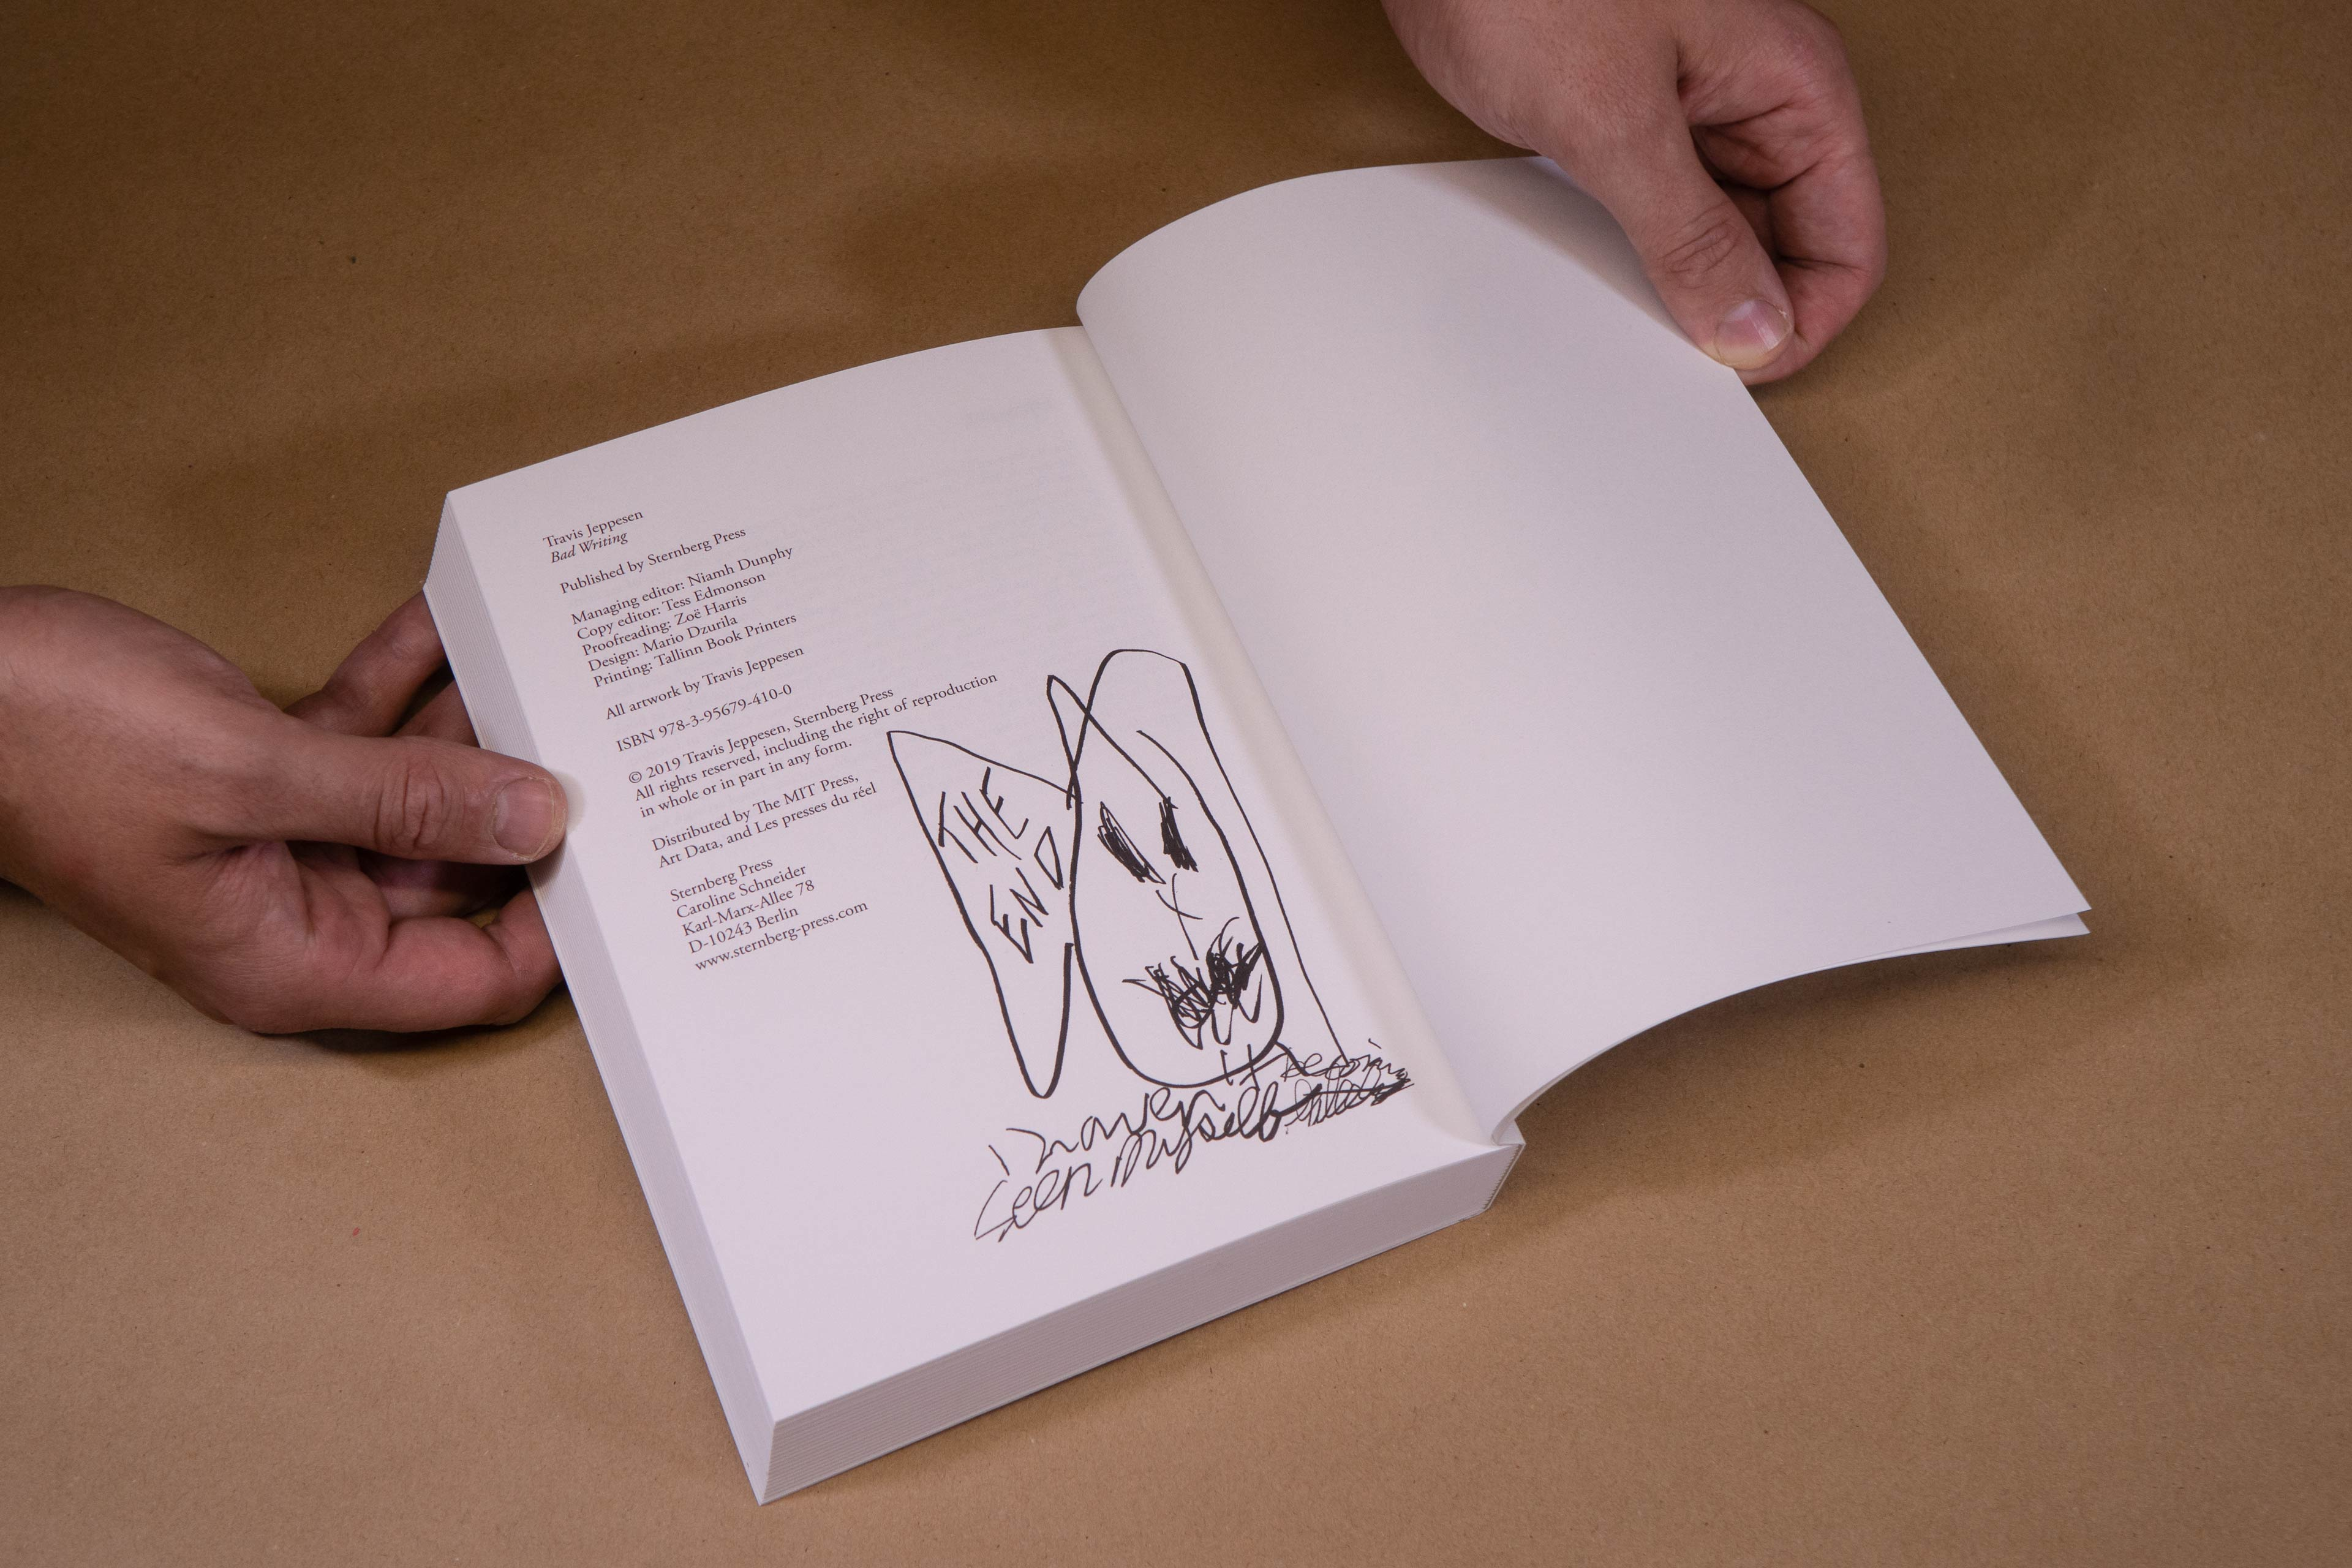 Travis Jeppesen Bad Writing Sternberg Press Book Cover Design Mario Dzurila